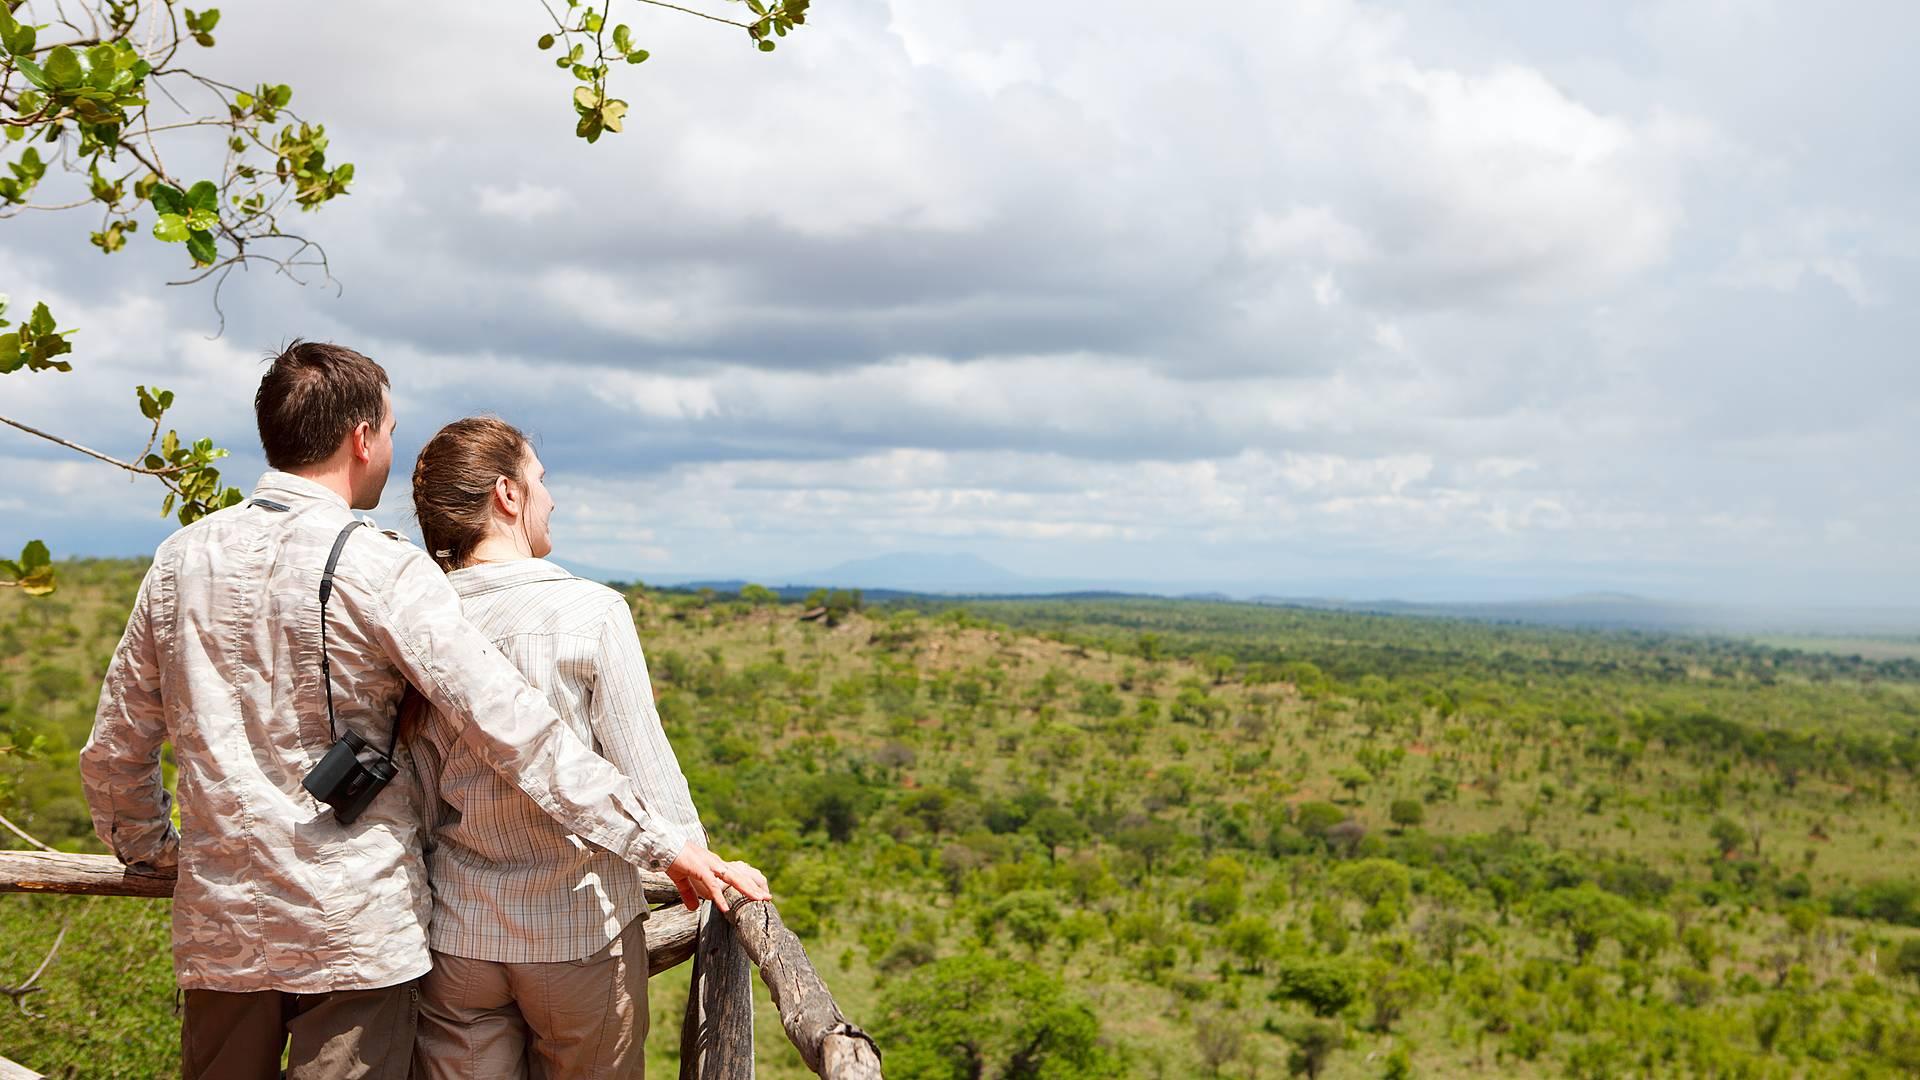 Romantik-Safari im Schatten der Baobabs